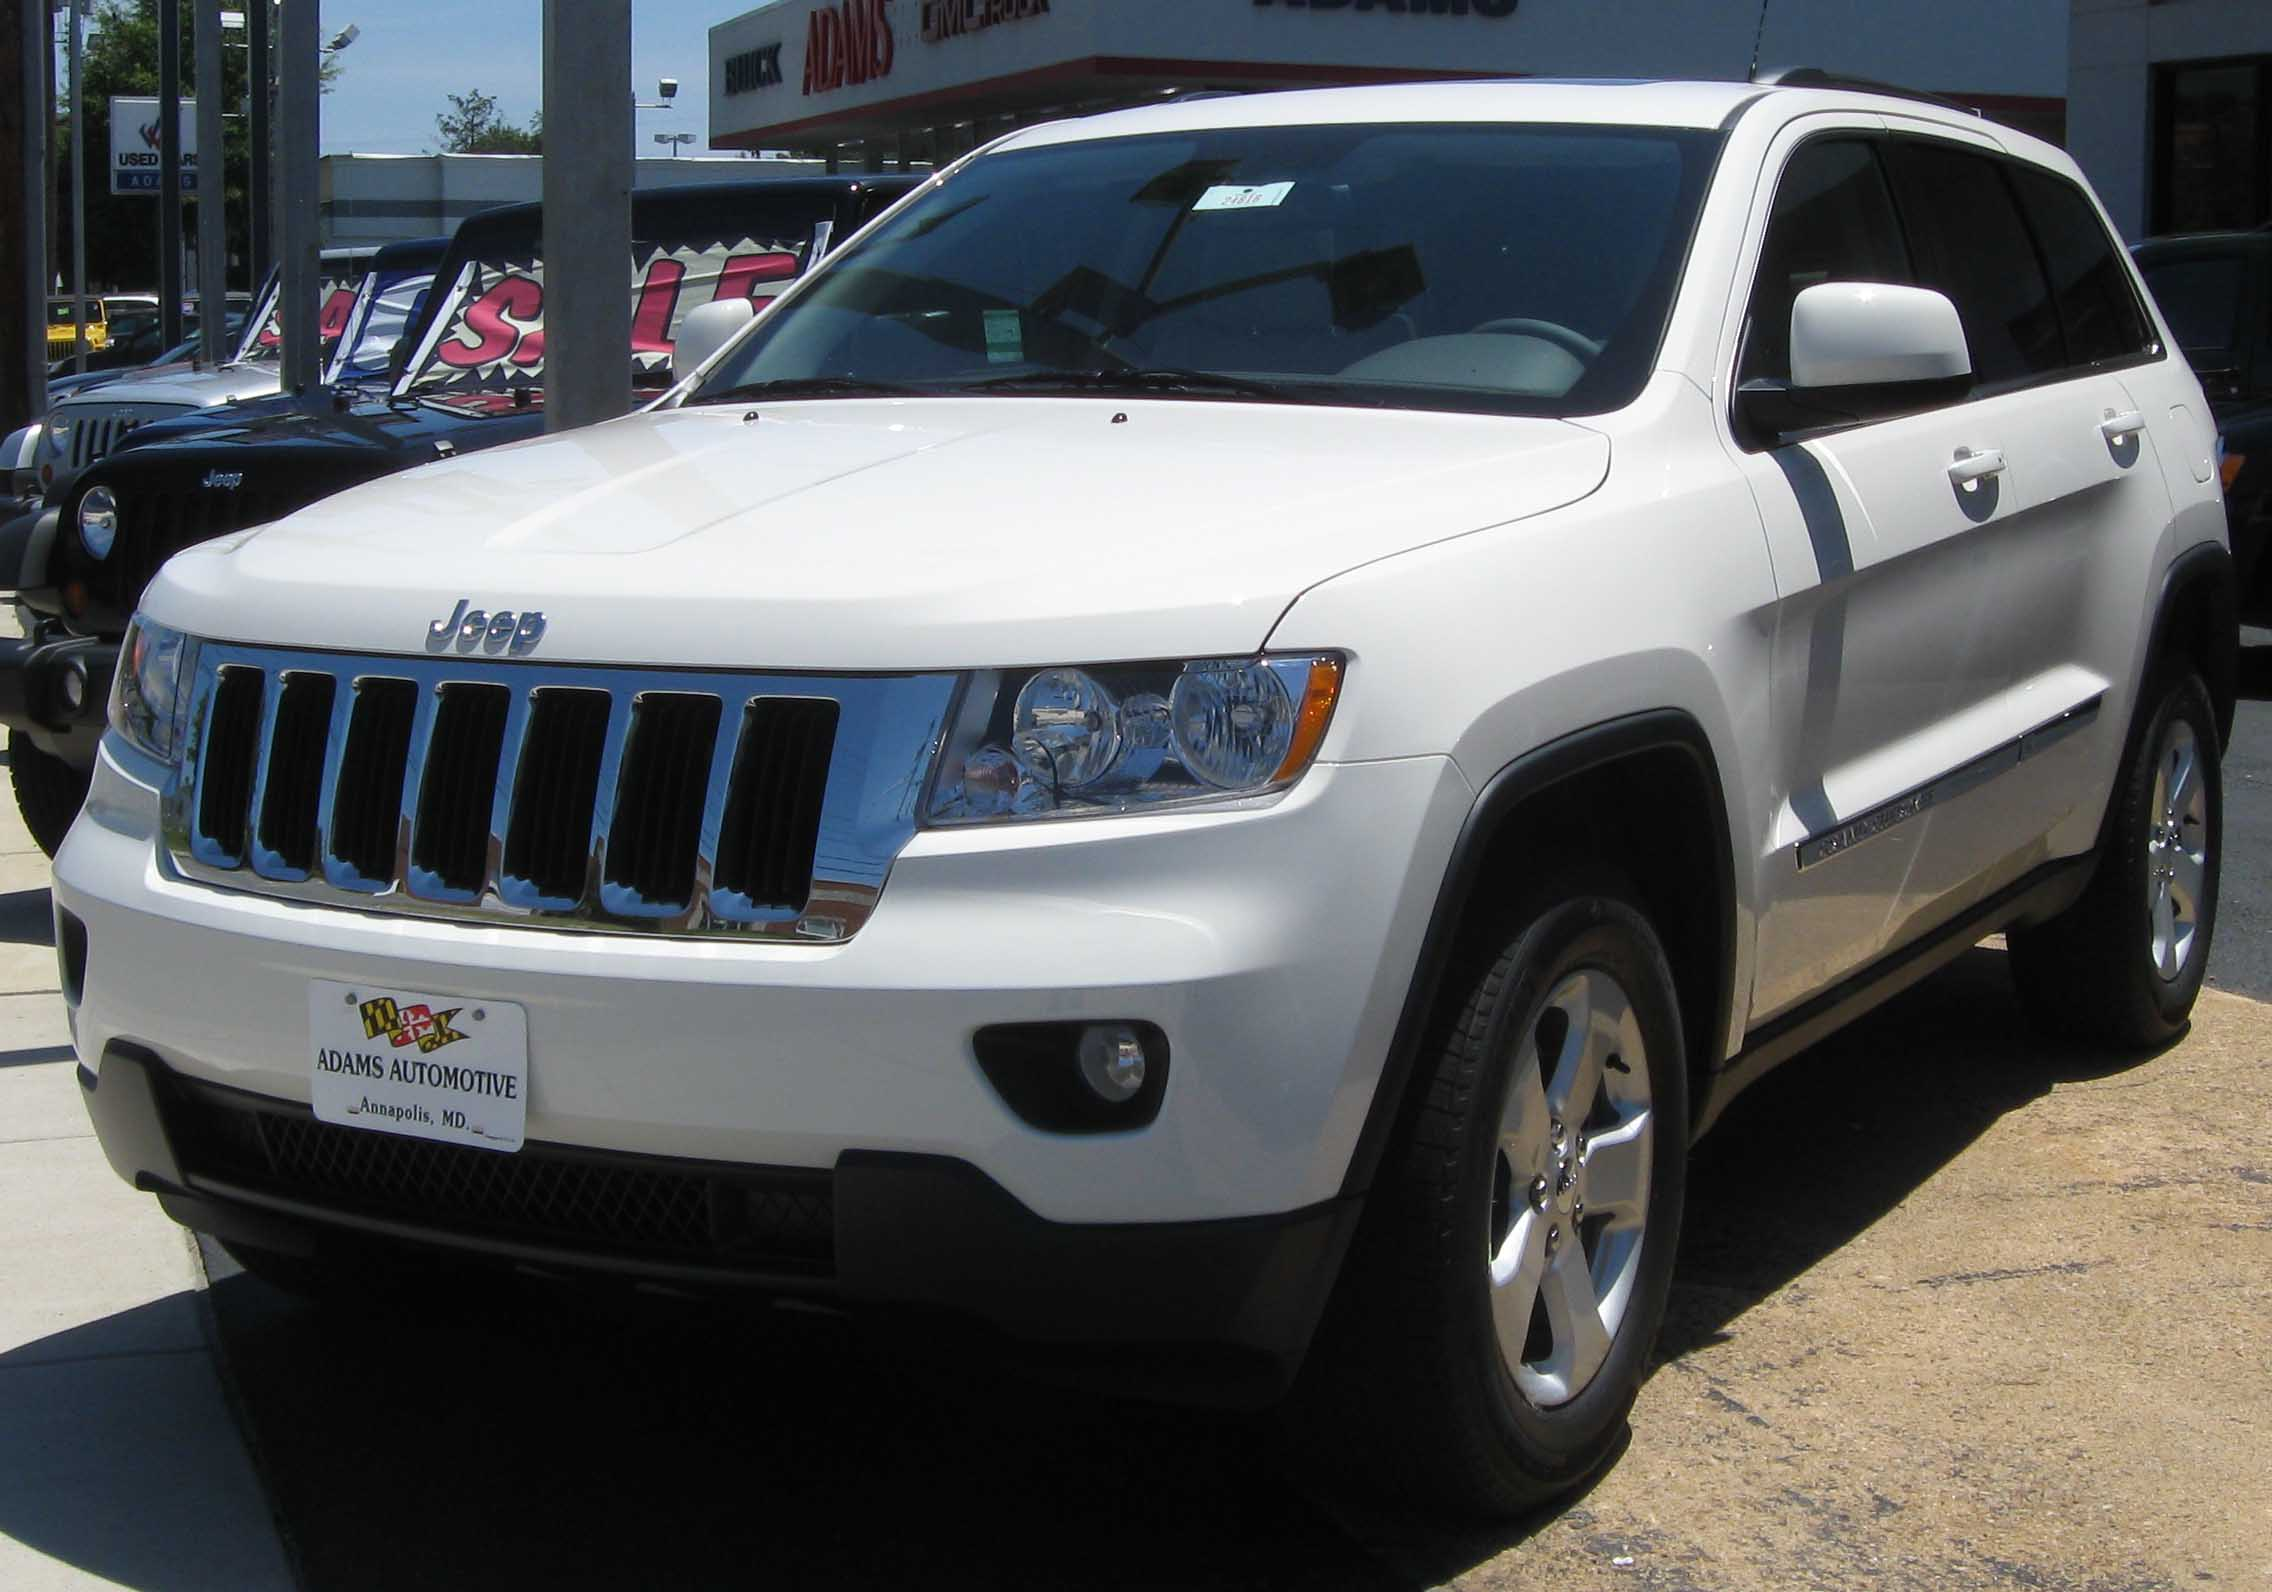 File:2011 Jeep Grand Cherokee Laredo X    07 03 2010.